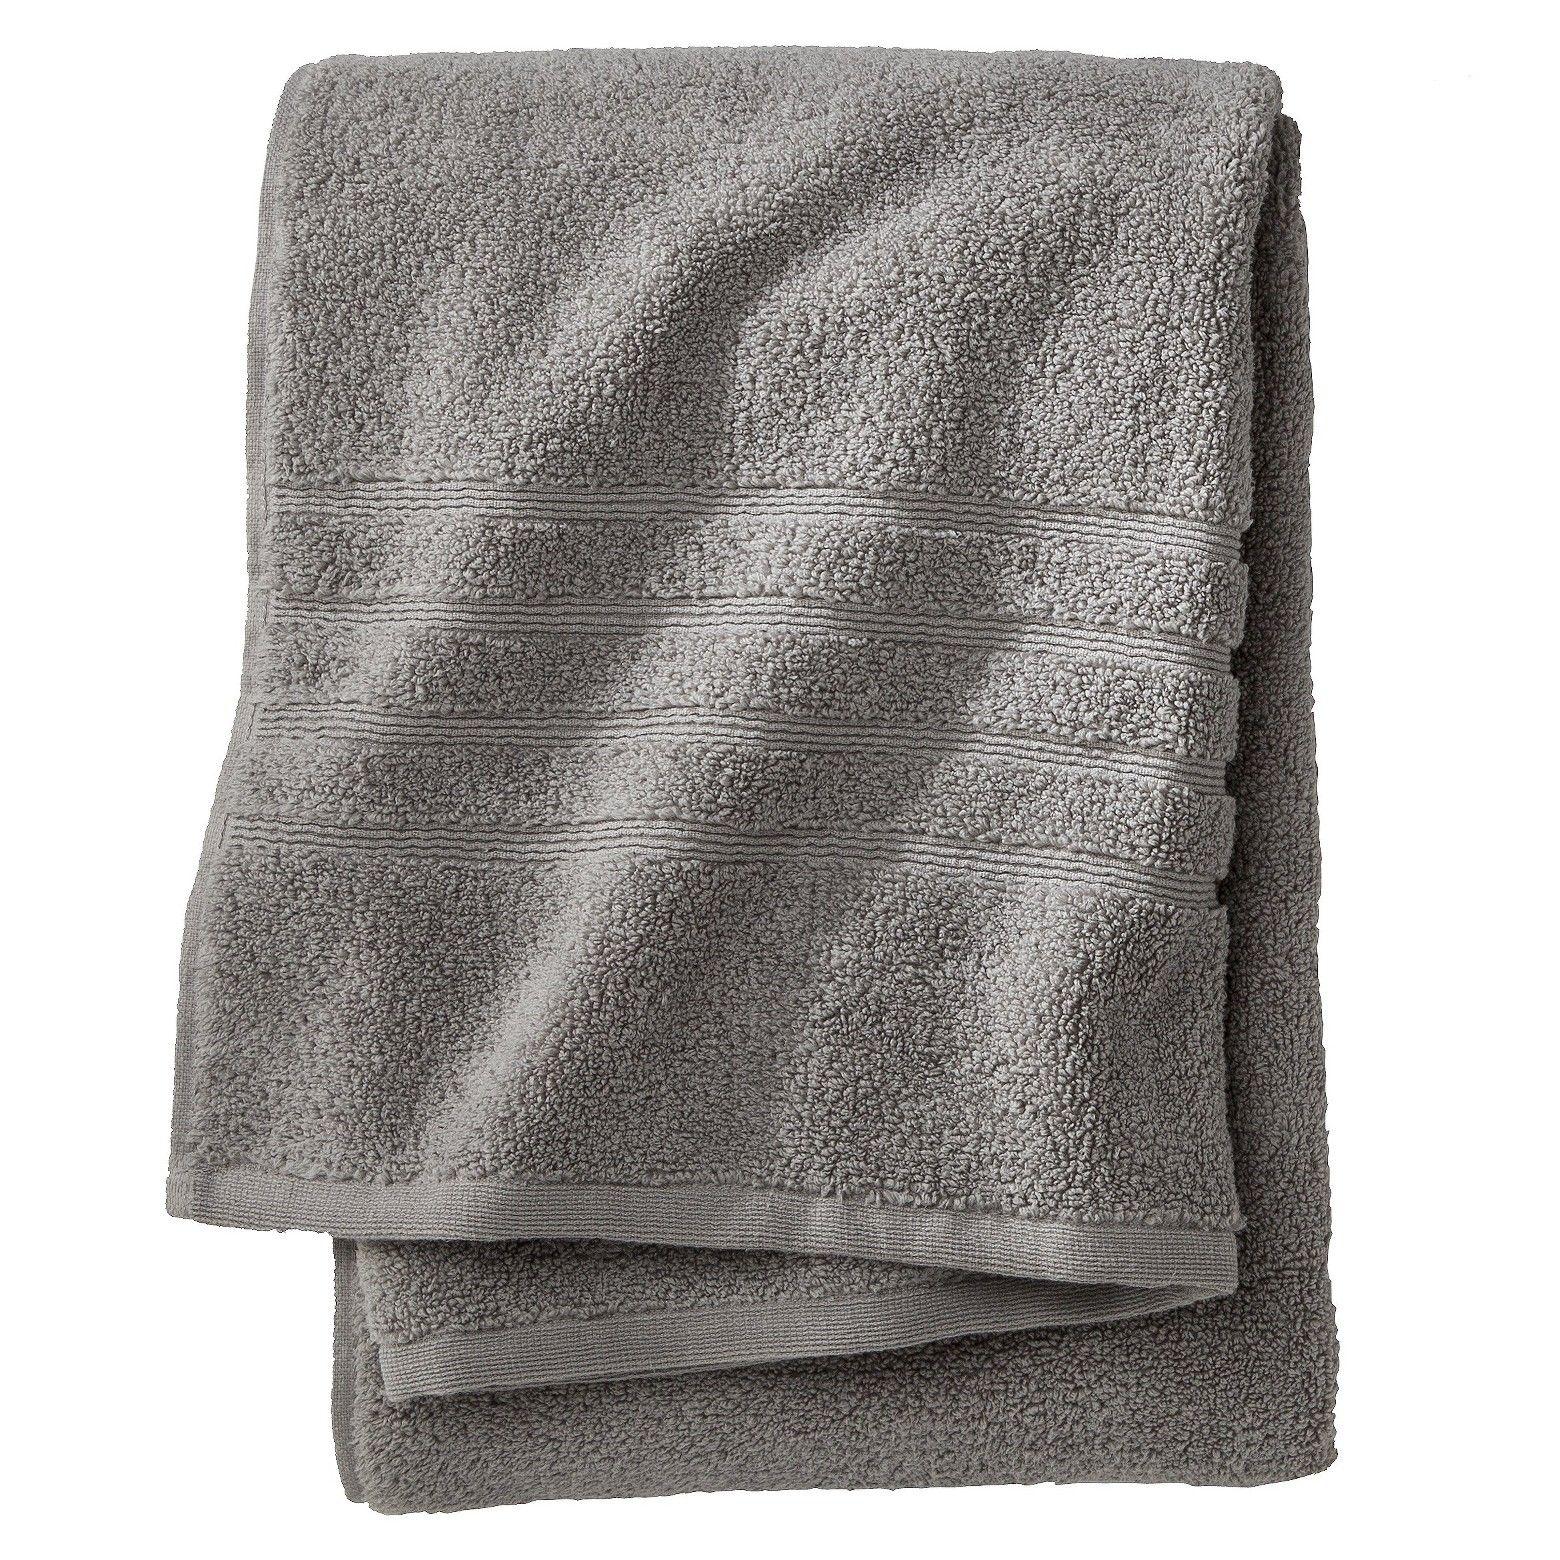 Enjoy The Everyday Luxury Of Fieldcrest Bath Towels These Plush